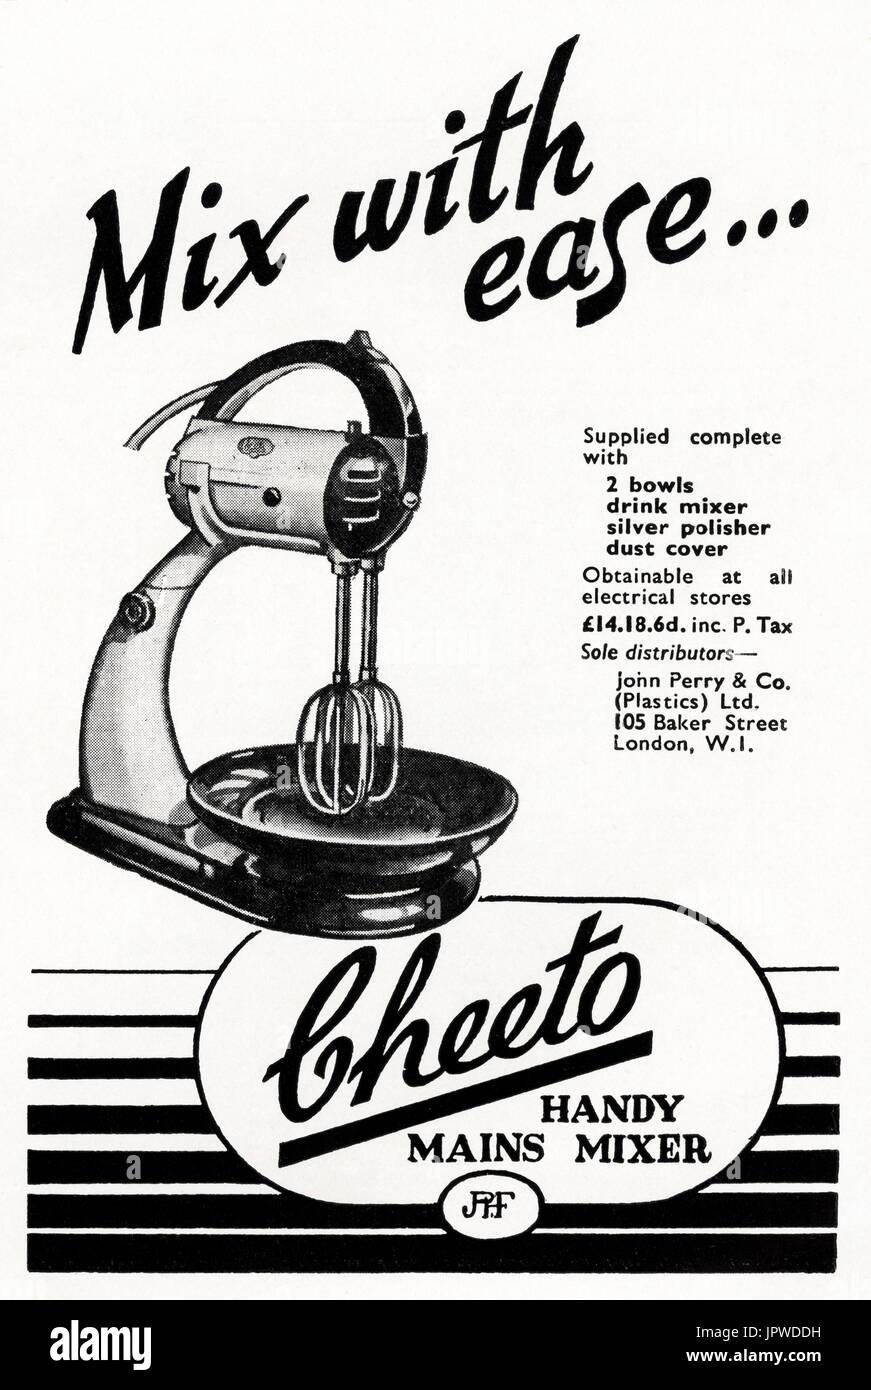 Retro Pink Jello Ad Poster Vintage Kitchen Poster 1950/'s VINTAGE KITCHEN AD